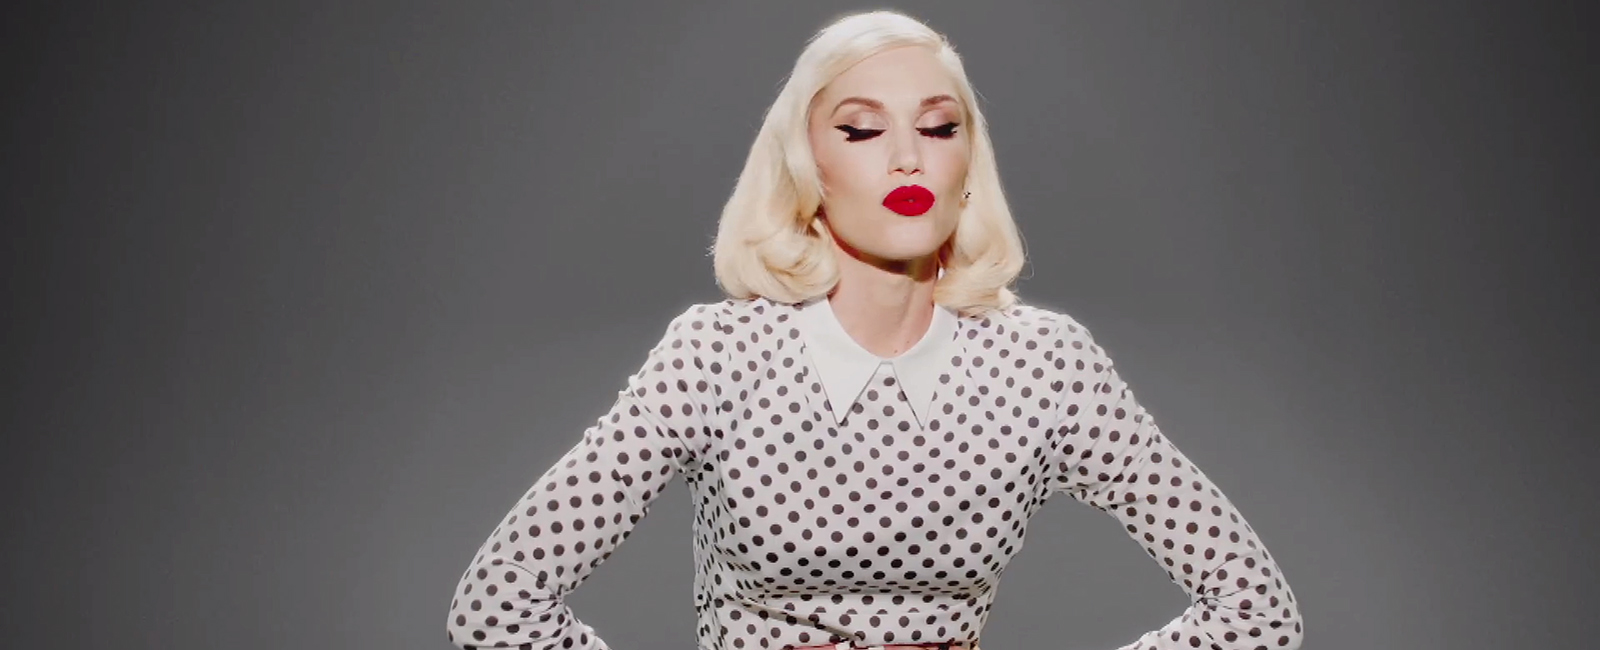 Gwen Stefani – Baby Don't Lie